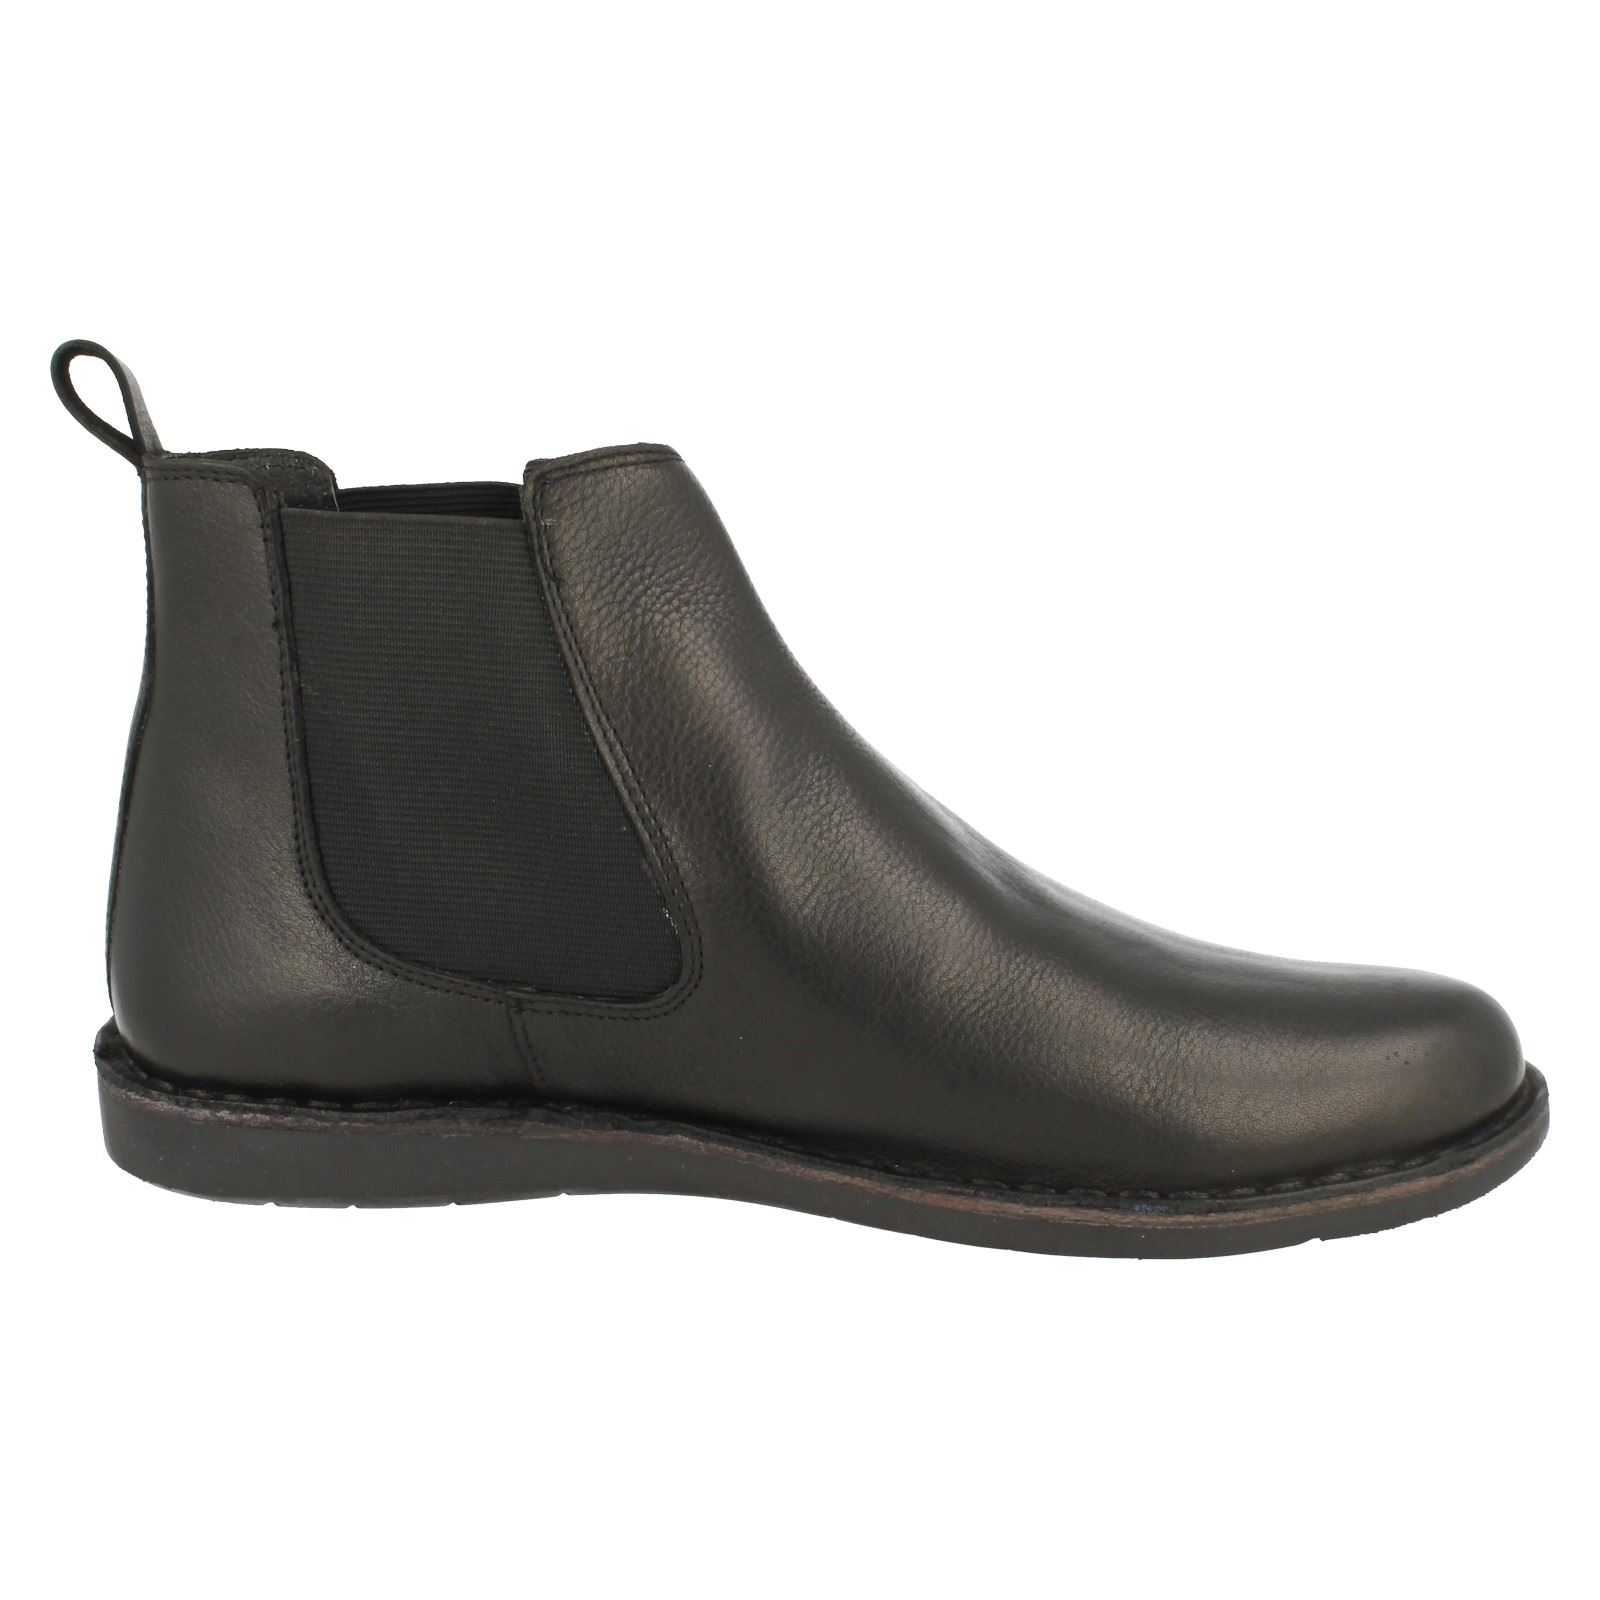 Mens-Padders-Pull-On-Chelsea-Boots-Jez thumbnail 5